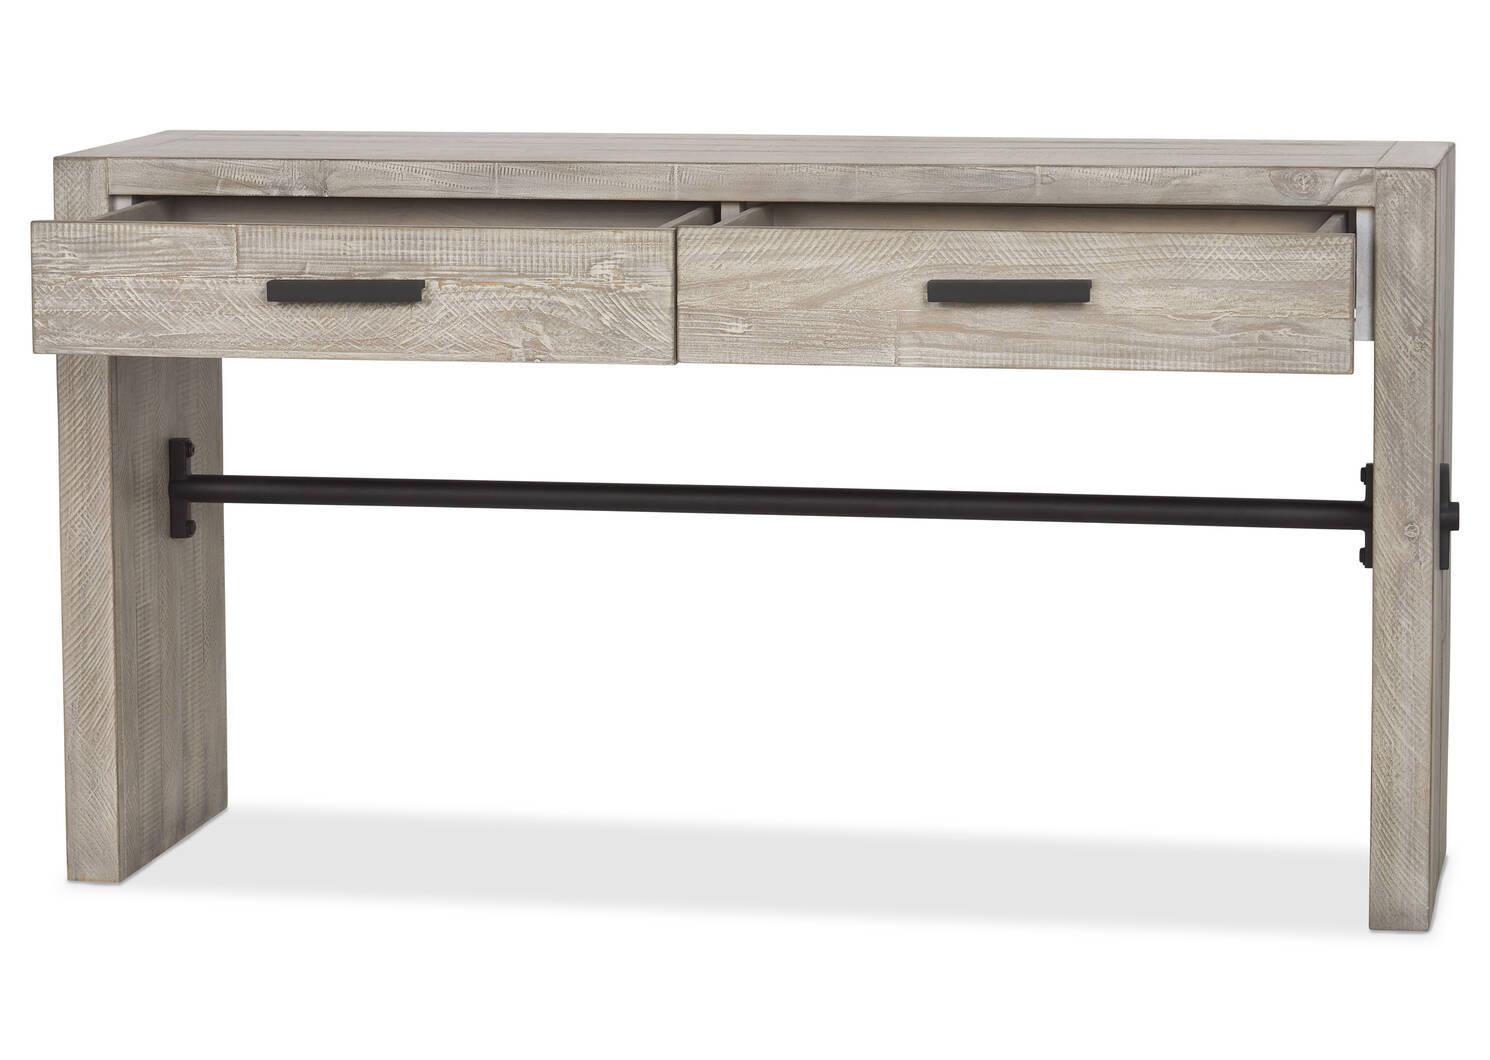 Table console Sienna -Ozark brouillard